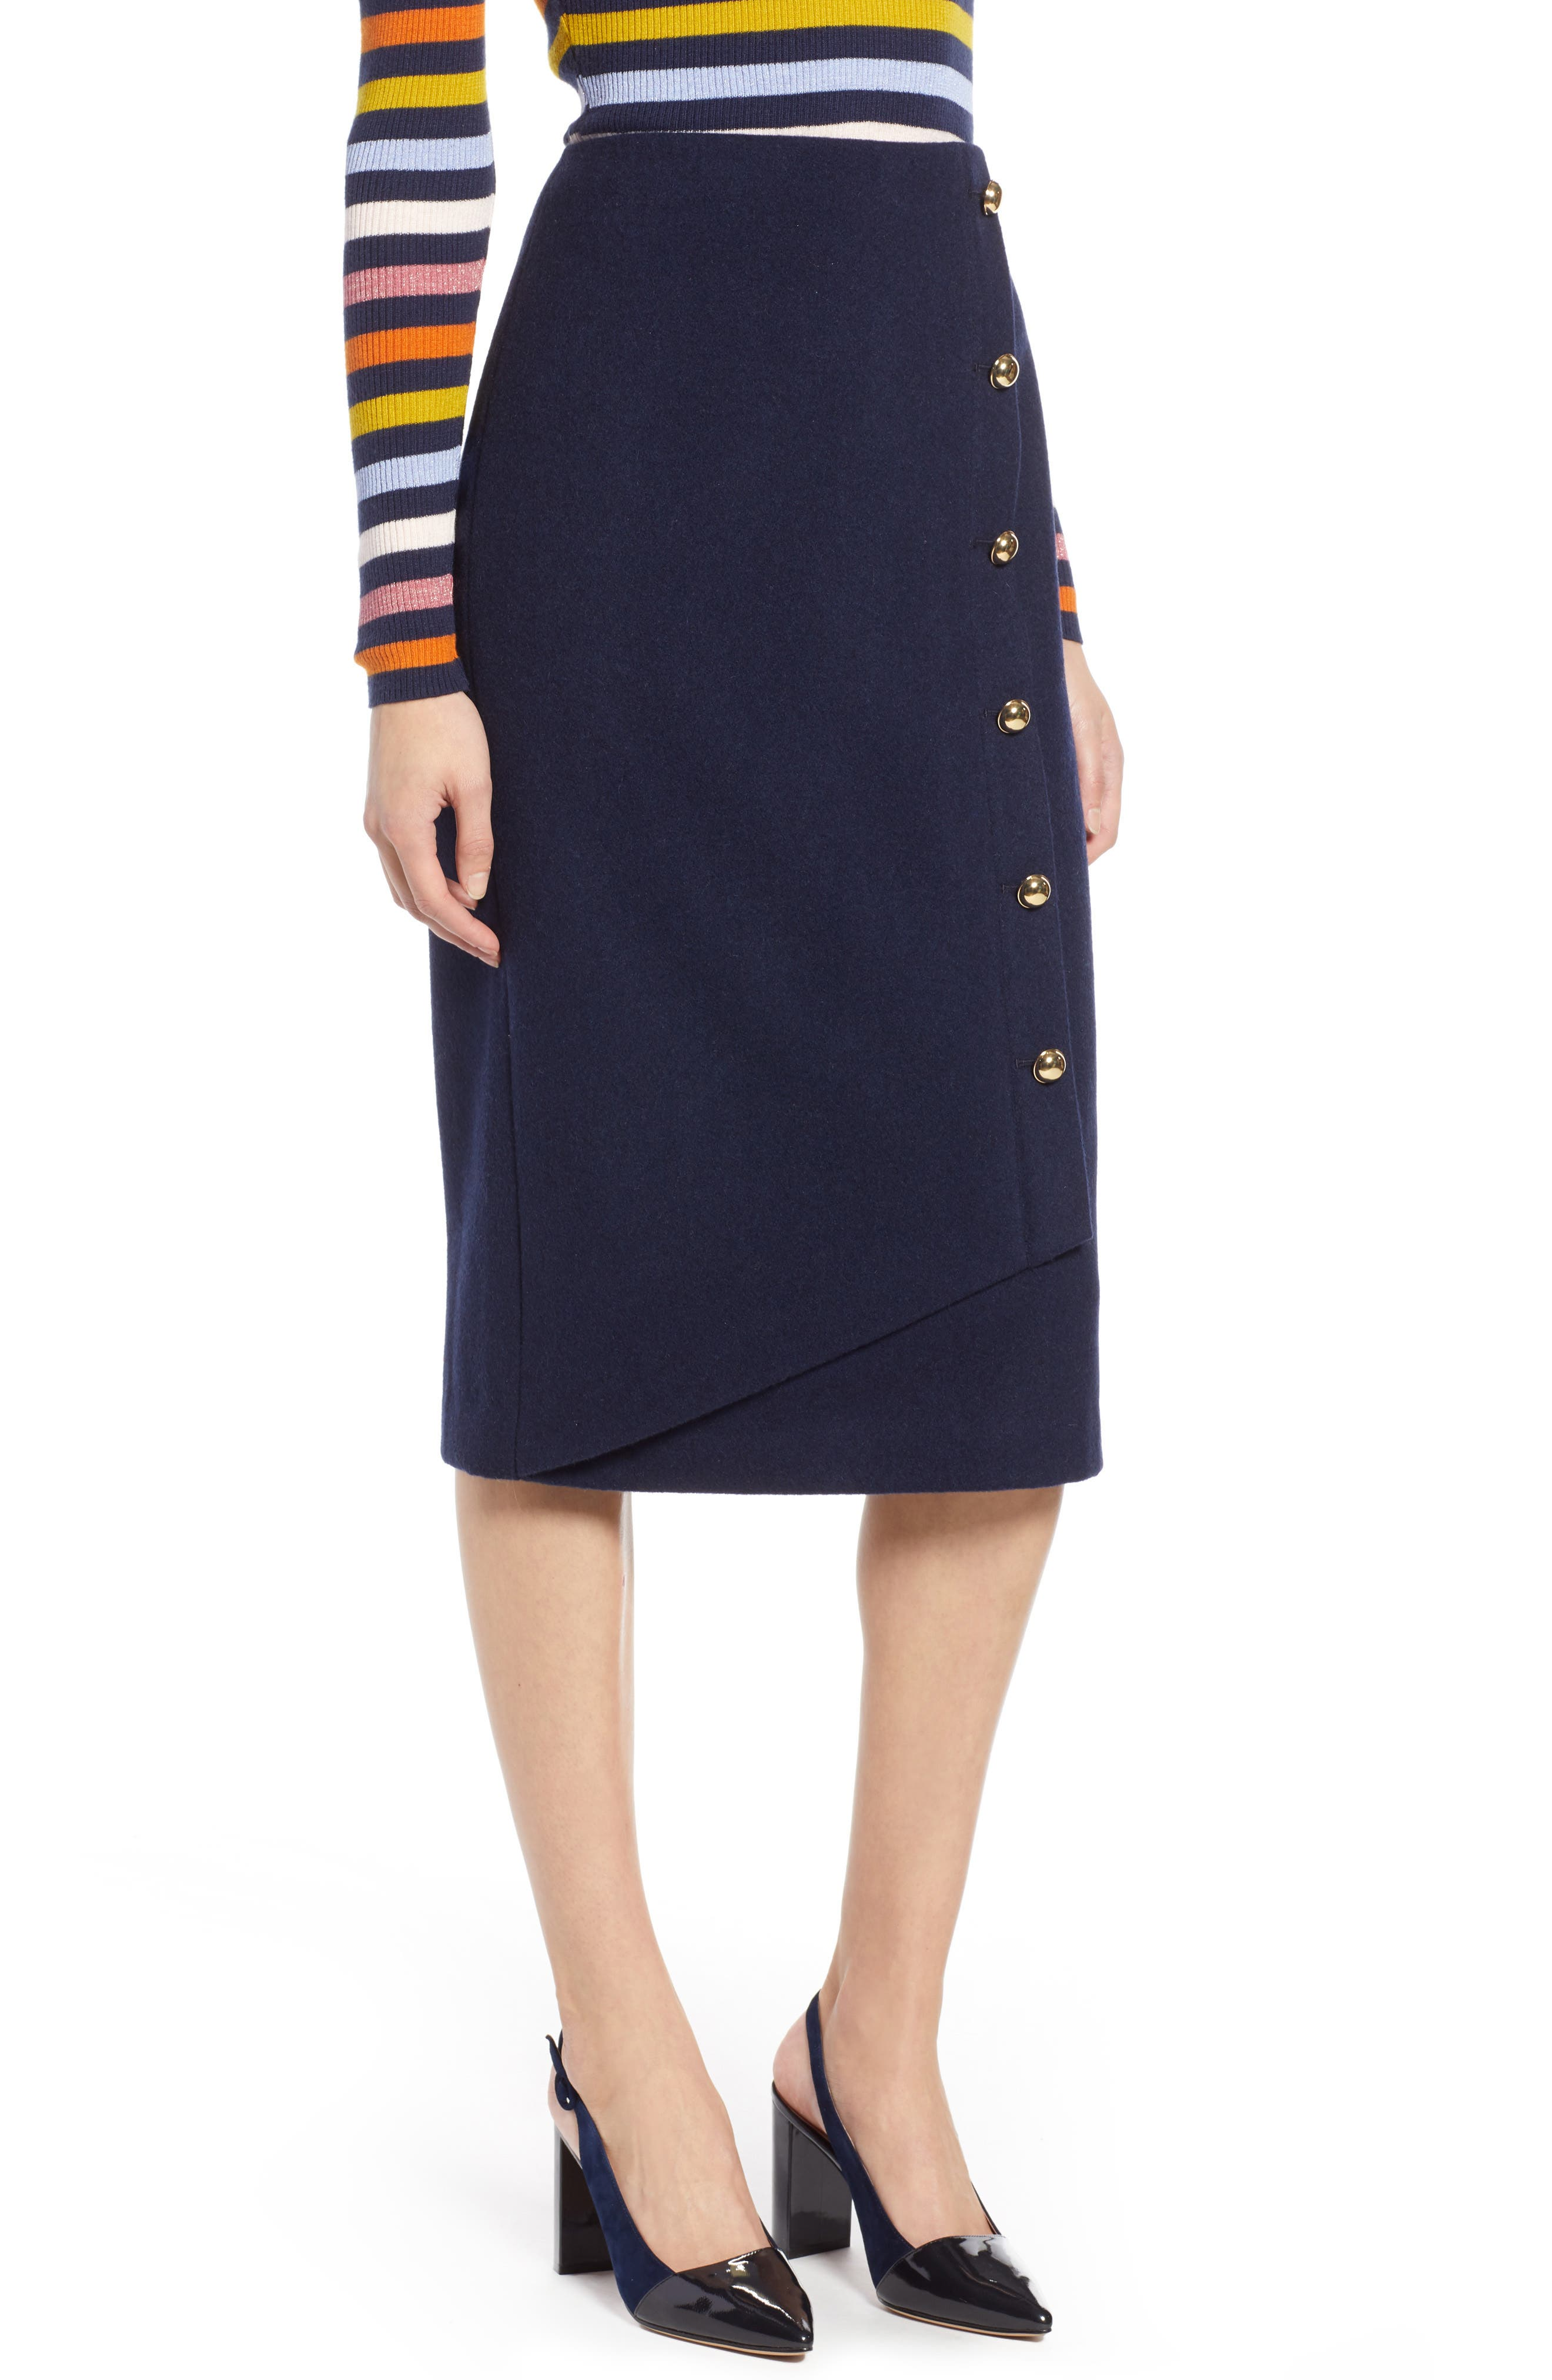 x Atlantic-Pacific Wrap Pencil Skirt,                             Main thumbnail 1, color,                             NAVY BLAZER